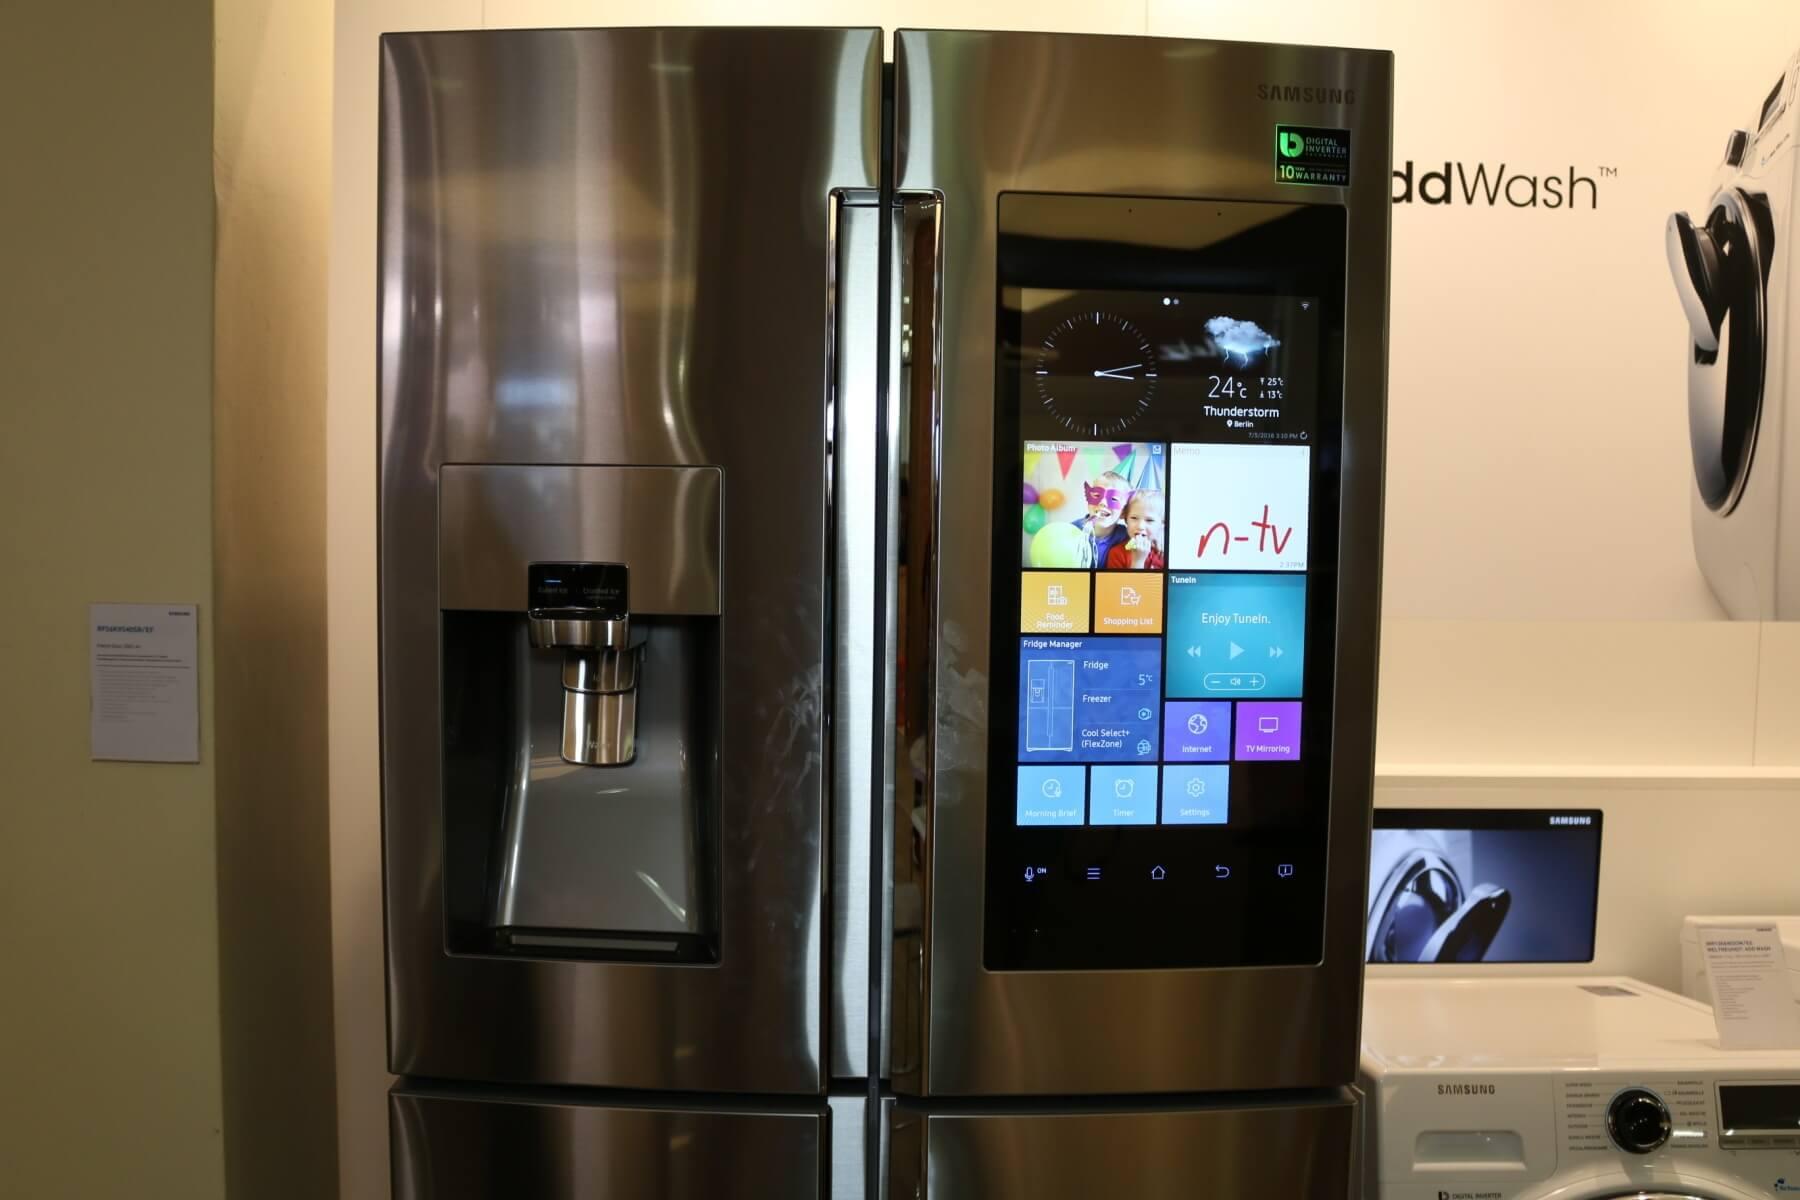 Ausgescherzt: Quadcore-Kühlschrank mit Full-HD-Display kommt zu uns